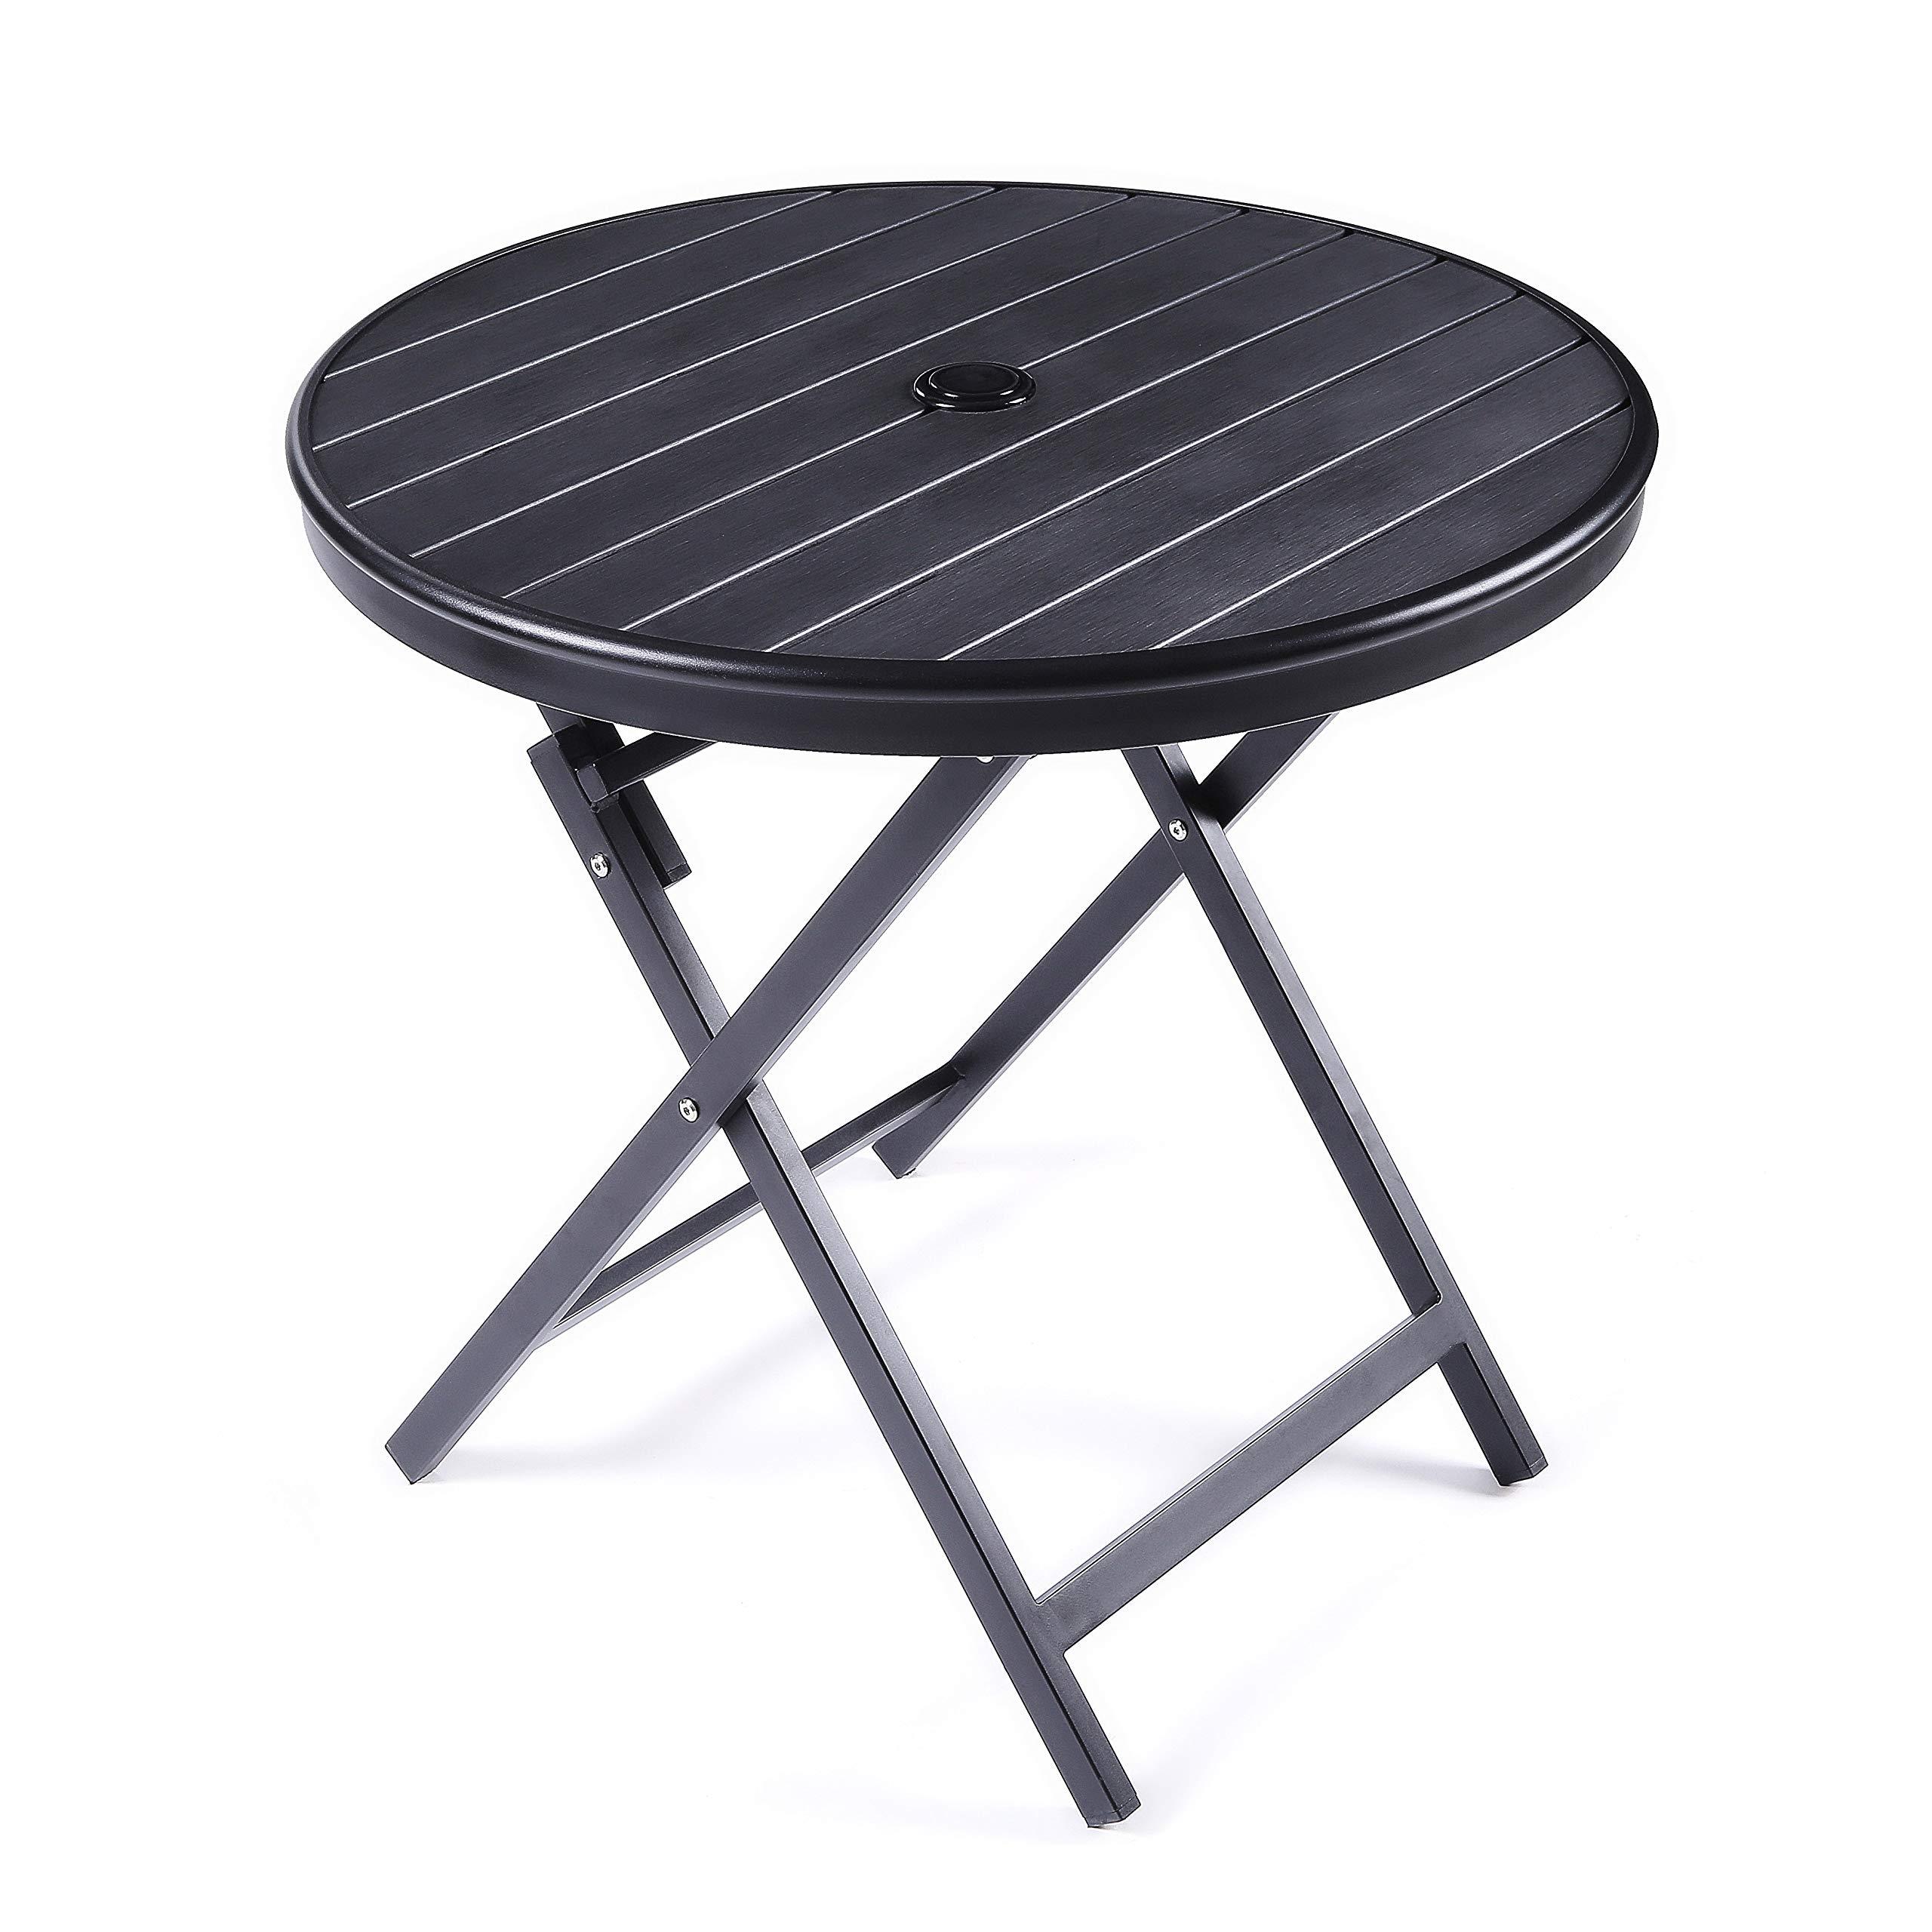 JIWU Large Outdoor Patio Portable Bistro Table, Round Folding Dining Table Aluminium Alloy & PE Wood- Dia.28.3'' x H27.6